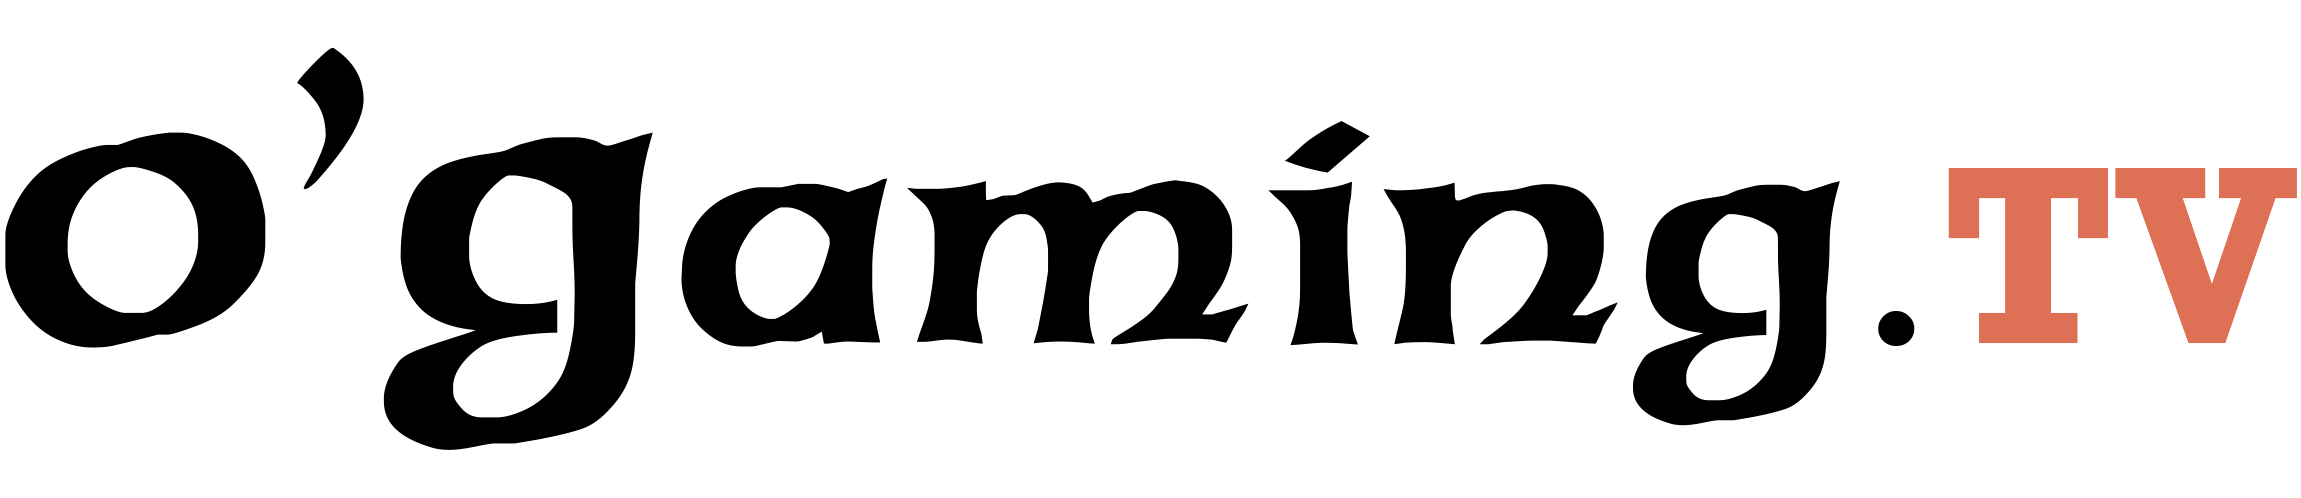 ogaming-logo